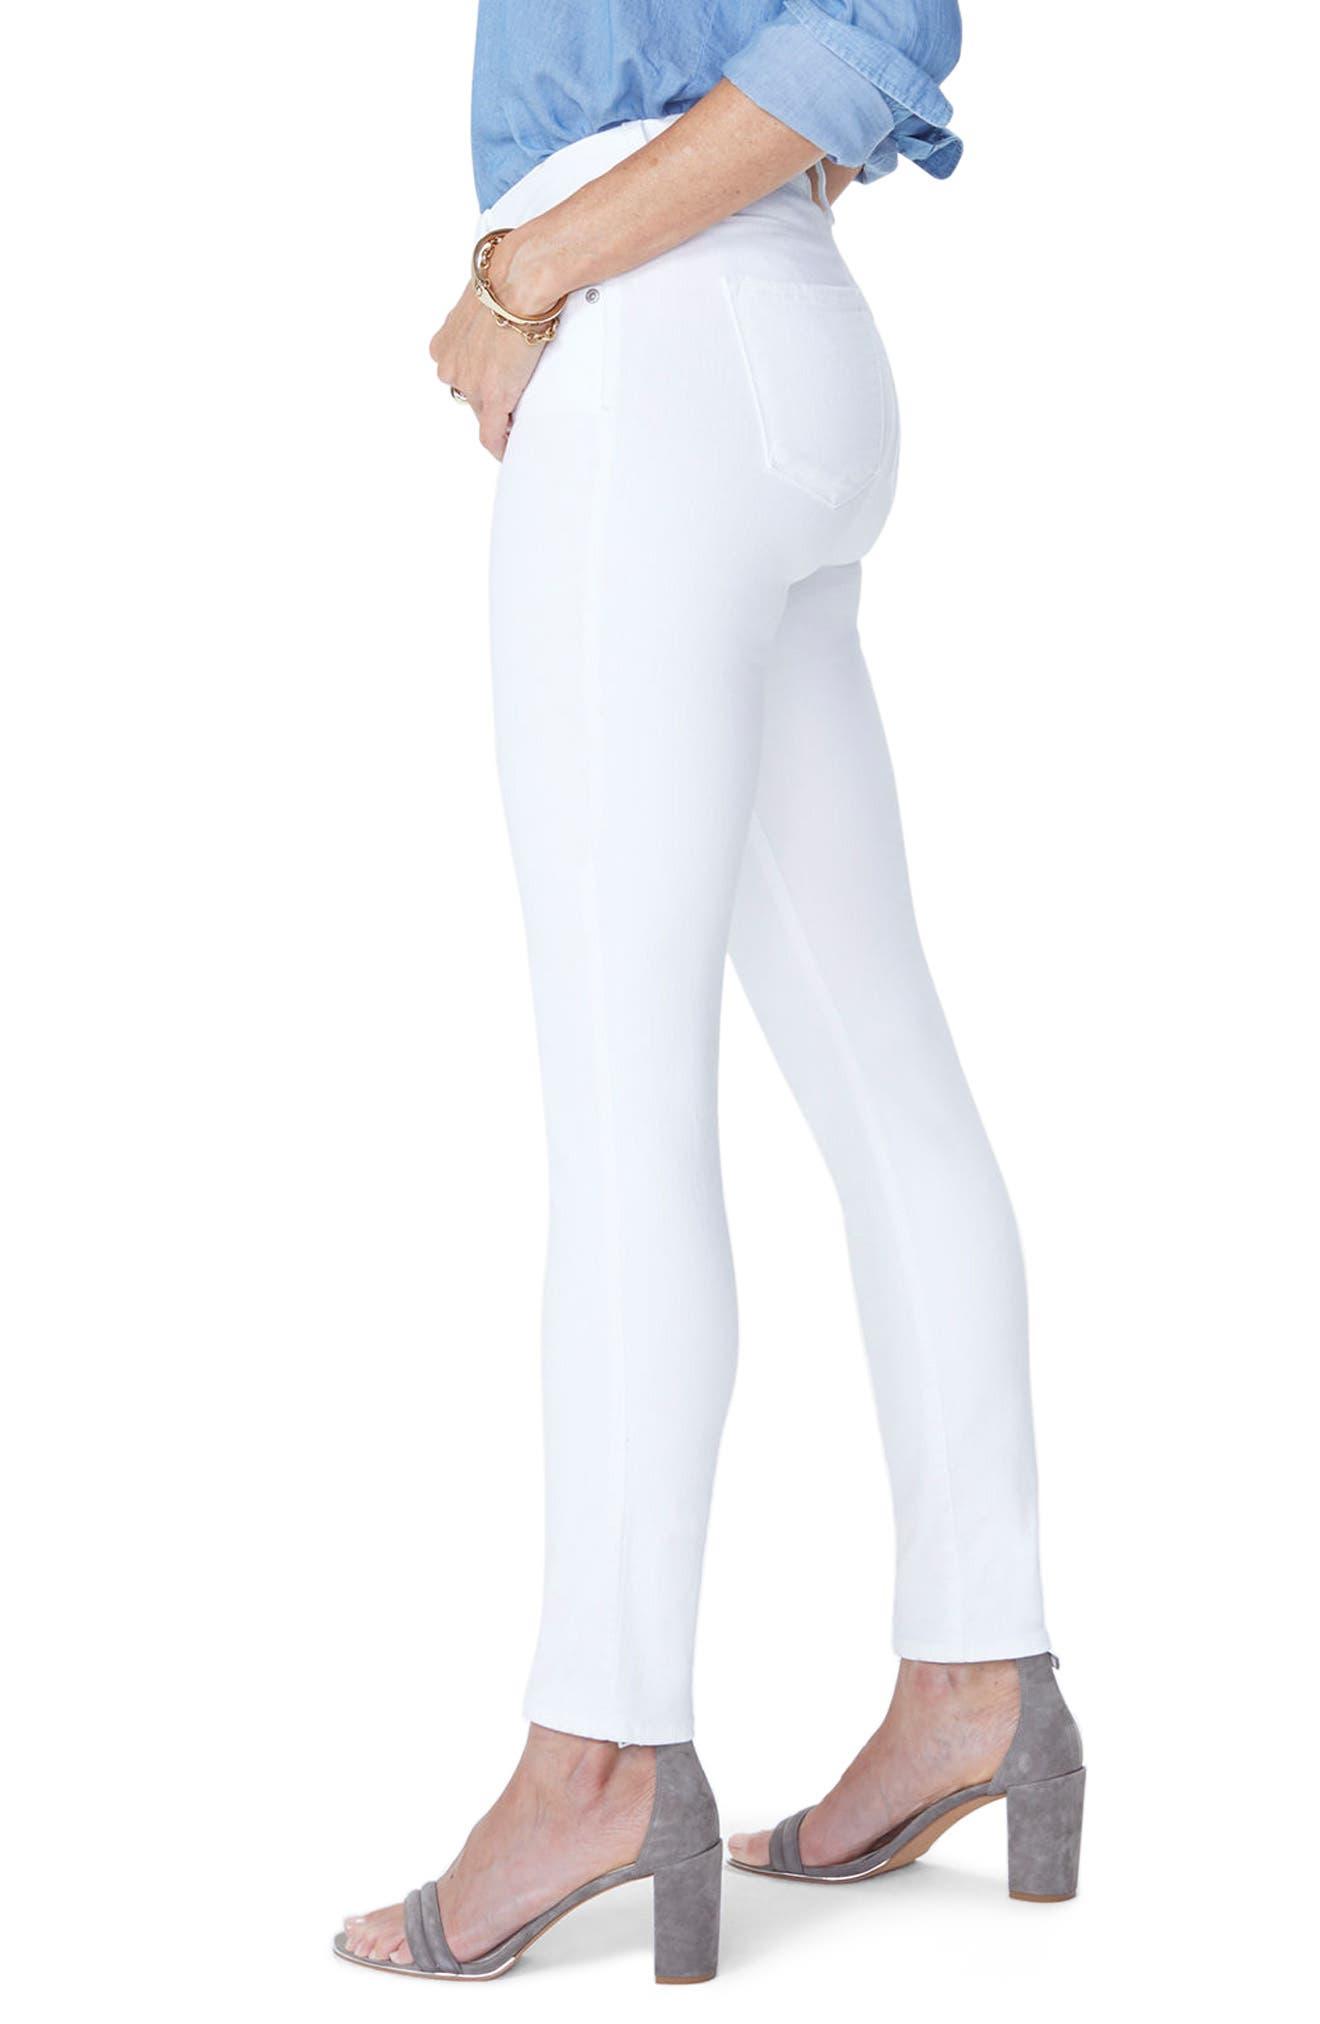 NYDJ, Ami Ankle Skinny Jeans, Alternate thumbnail 3, color, OPTIC WHITE